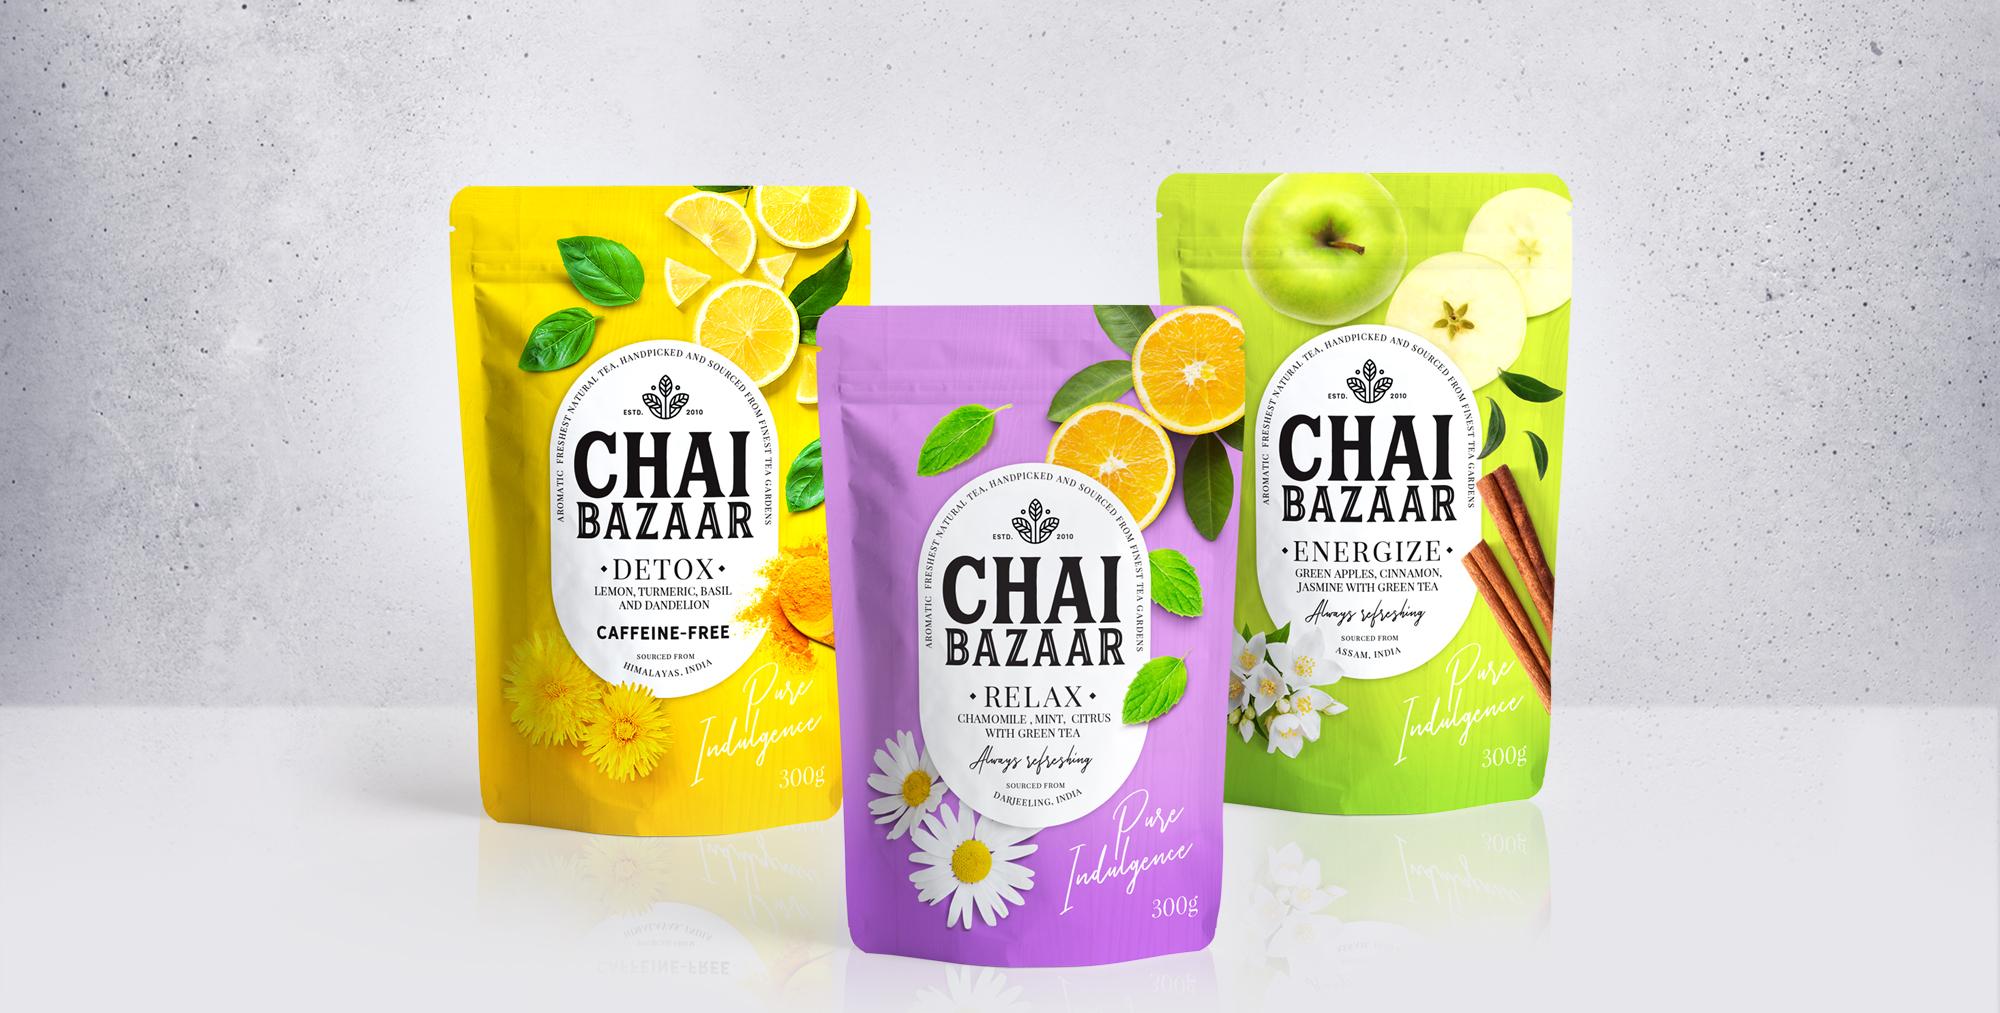 Firstbase Creates a Vibrant Packaging Design for Chai Bazaar